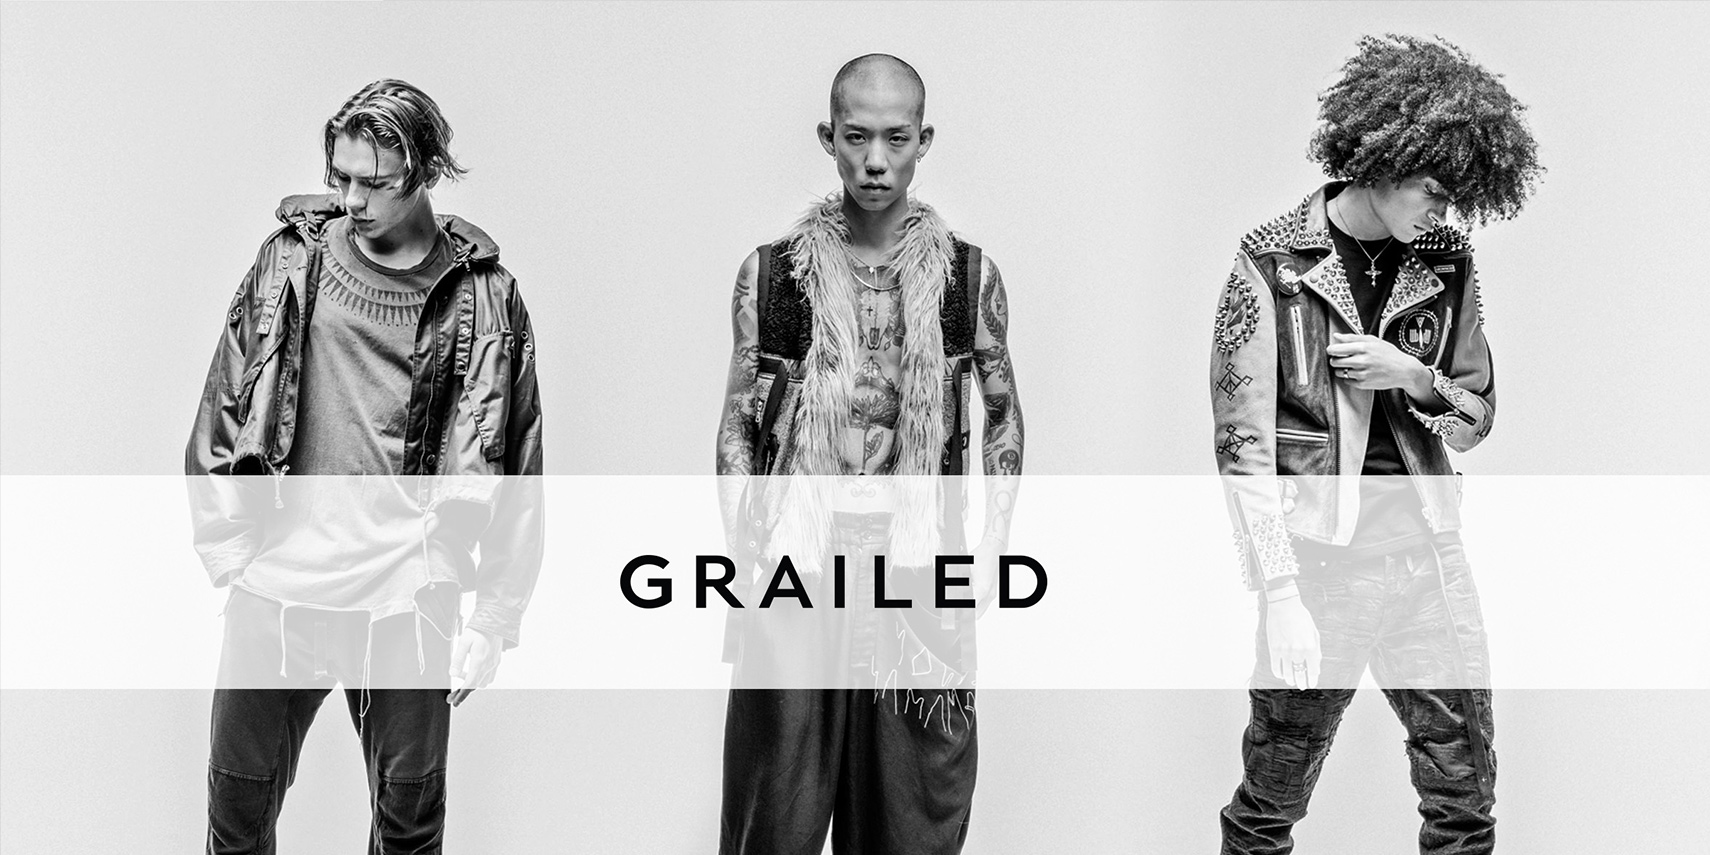 Grailed